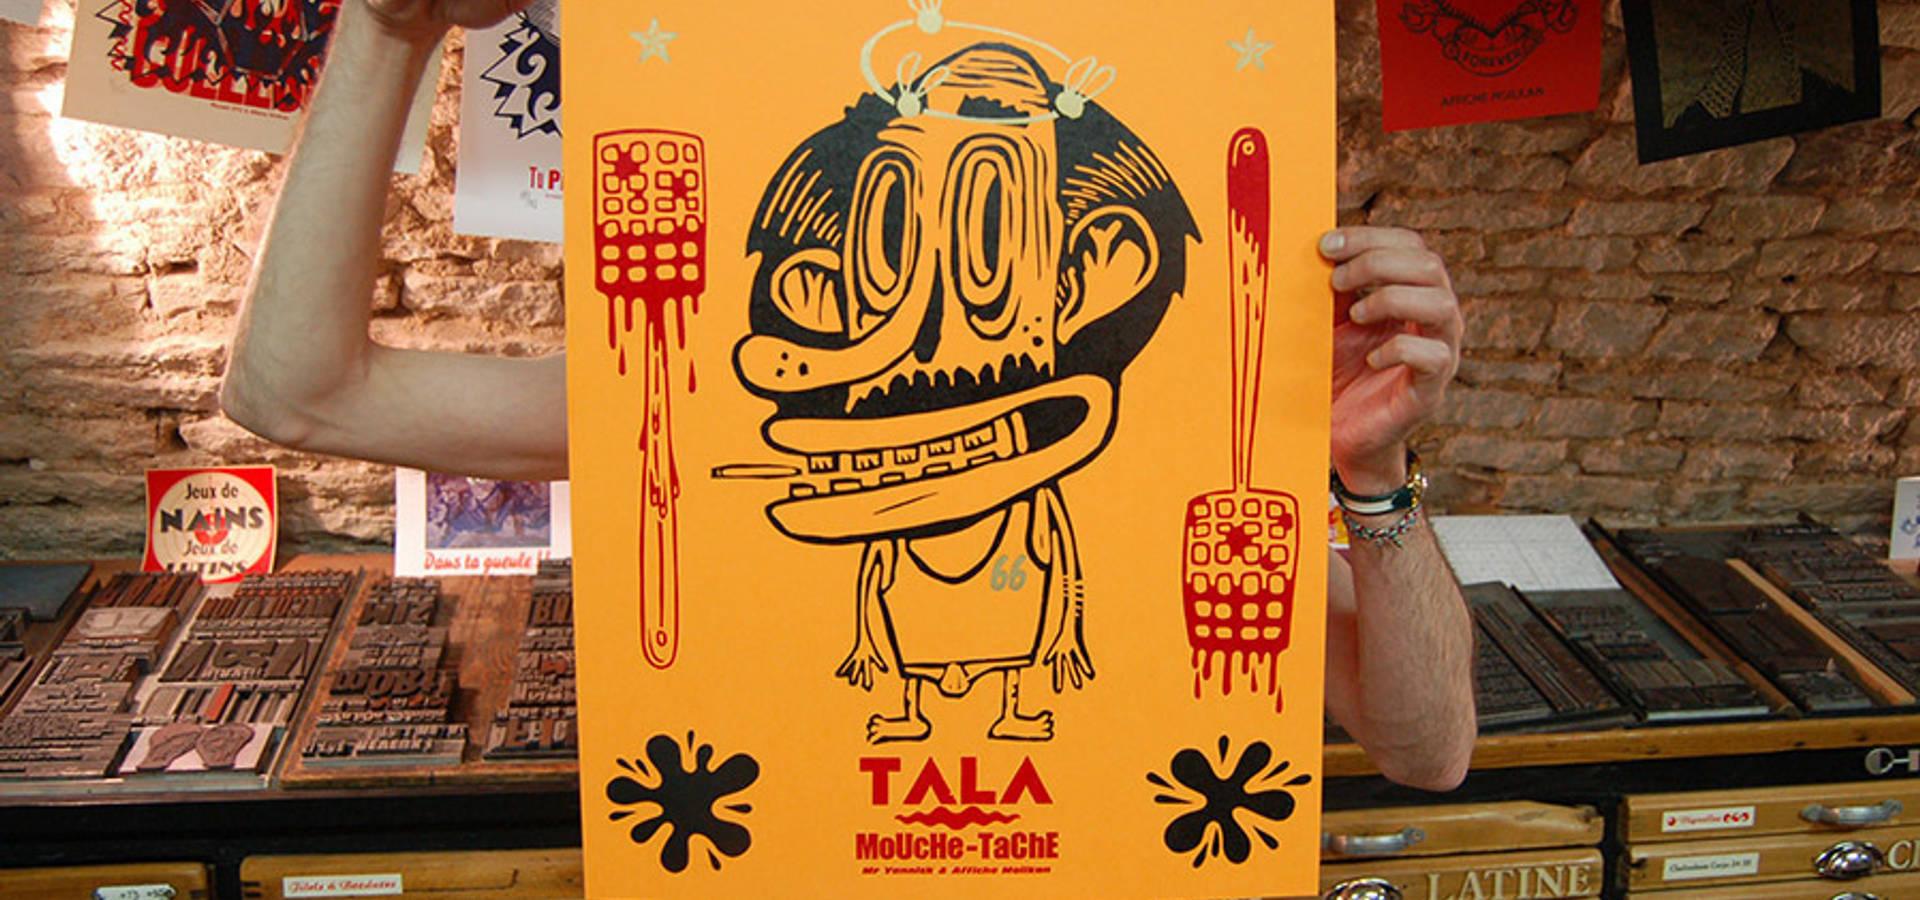 Affiche Moilkan tala mouche-tache !affiche moilkan | homify